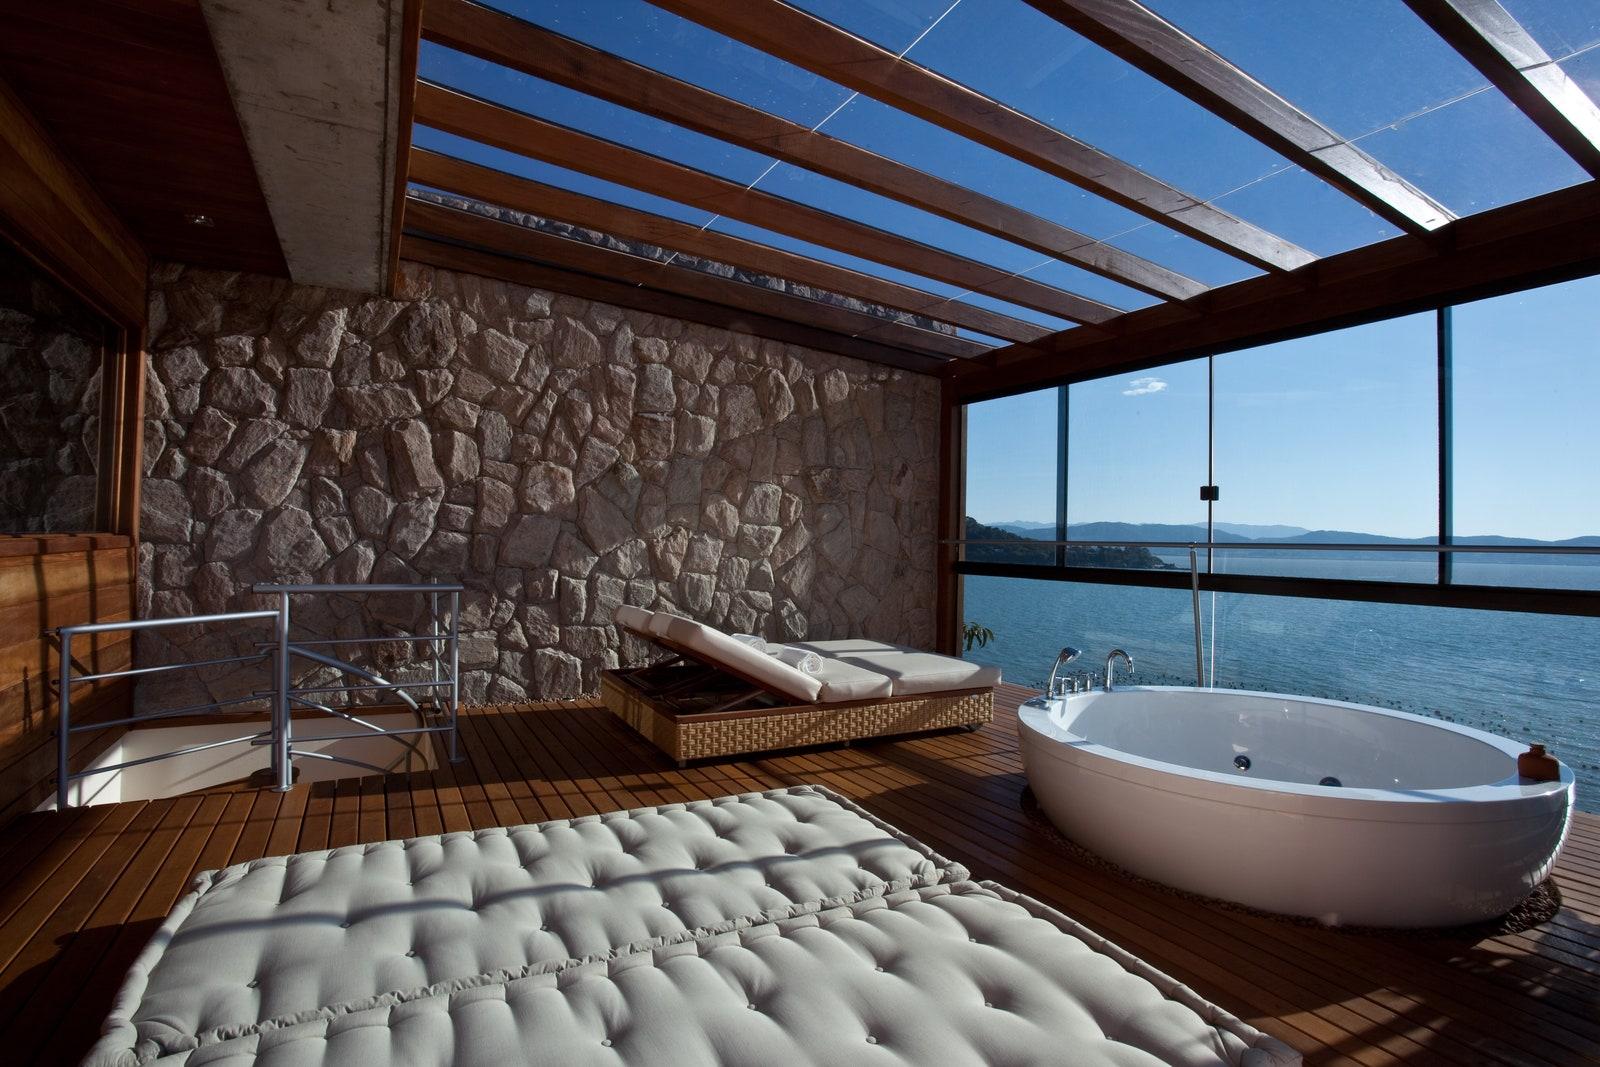 Desain kamar mandi di Ponta dos Ganchos Exclusive Resort, Brasil - source: architecturaldigest.com